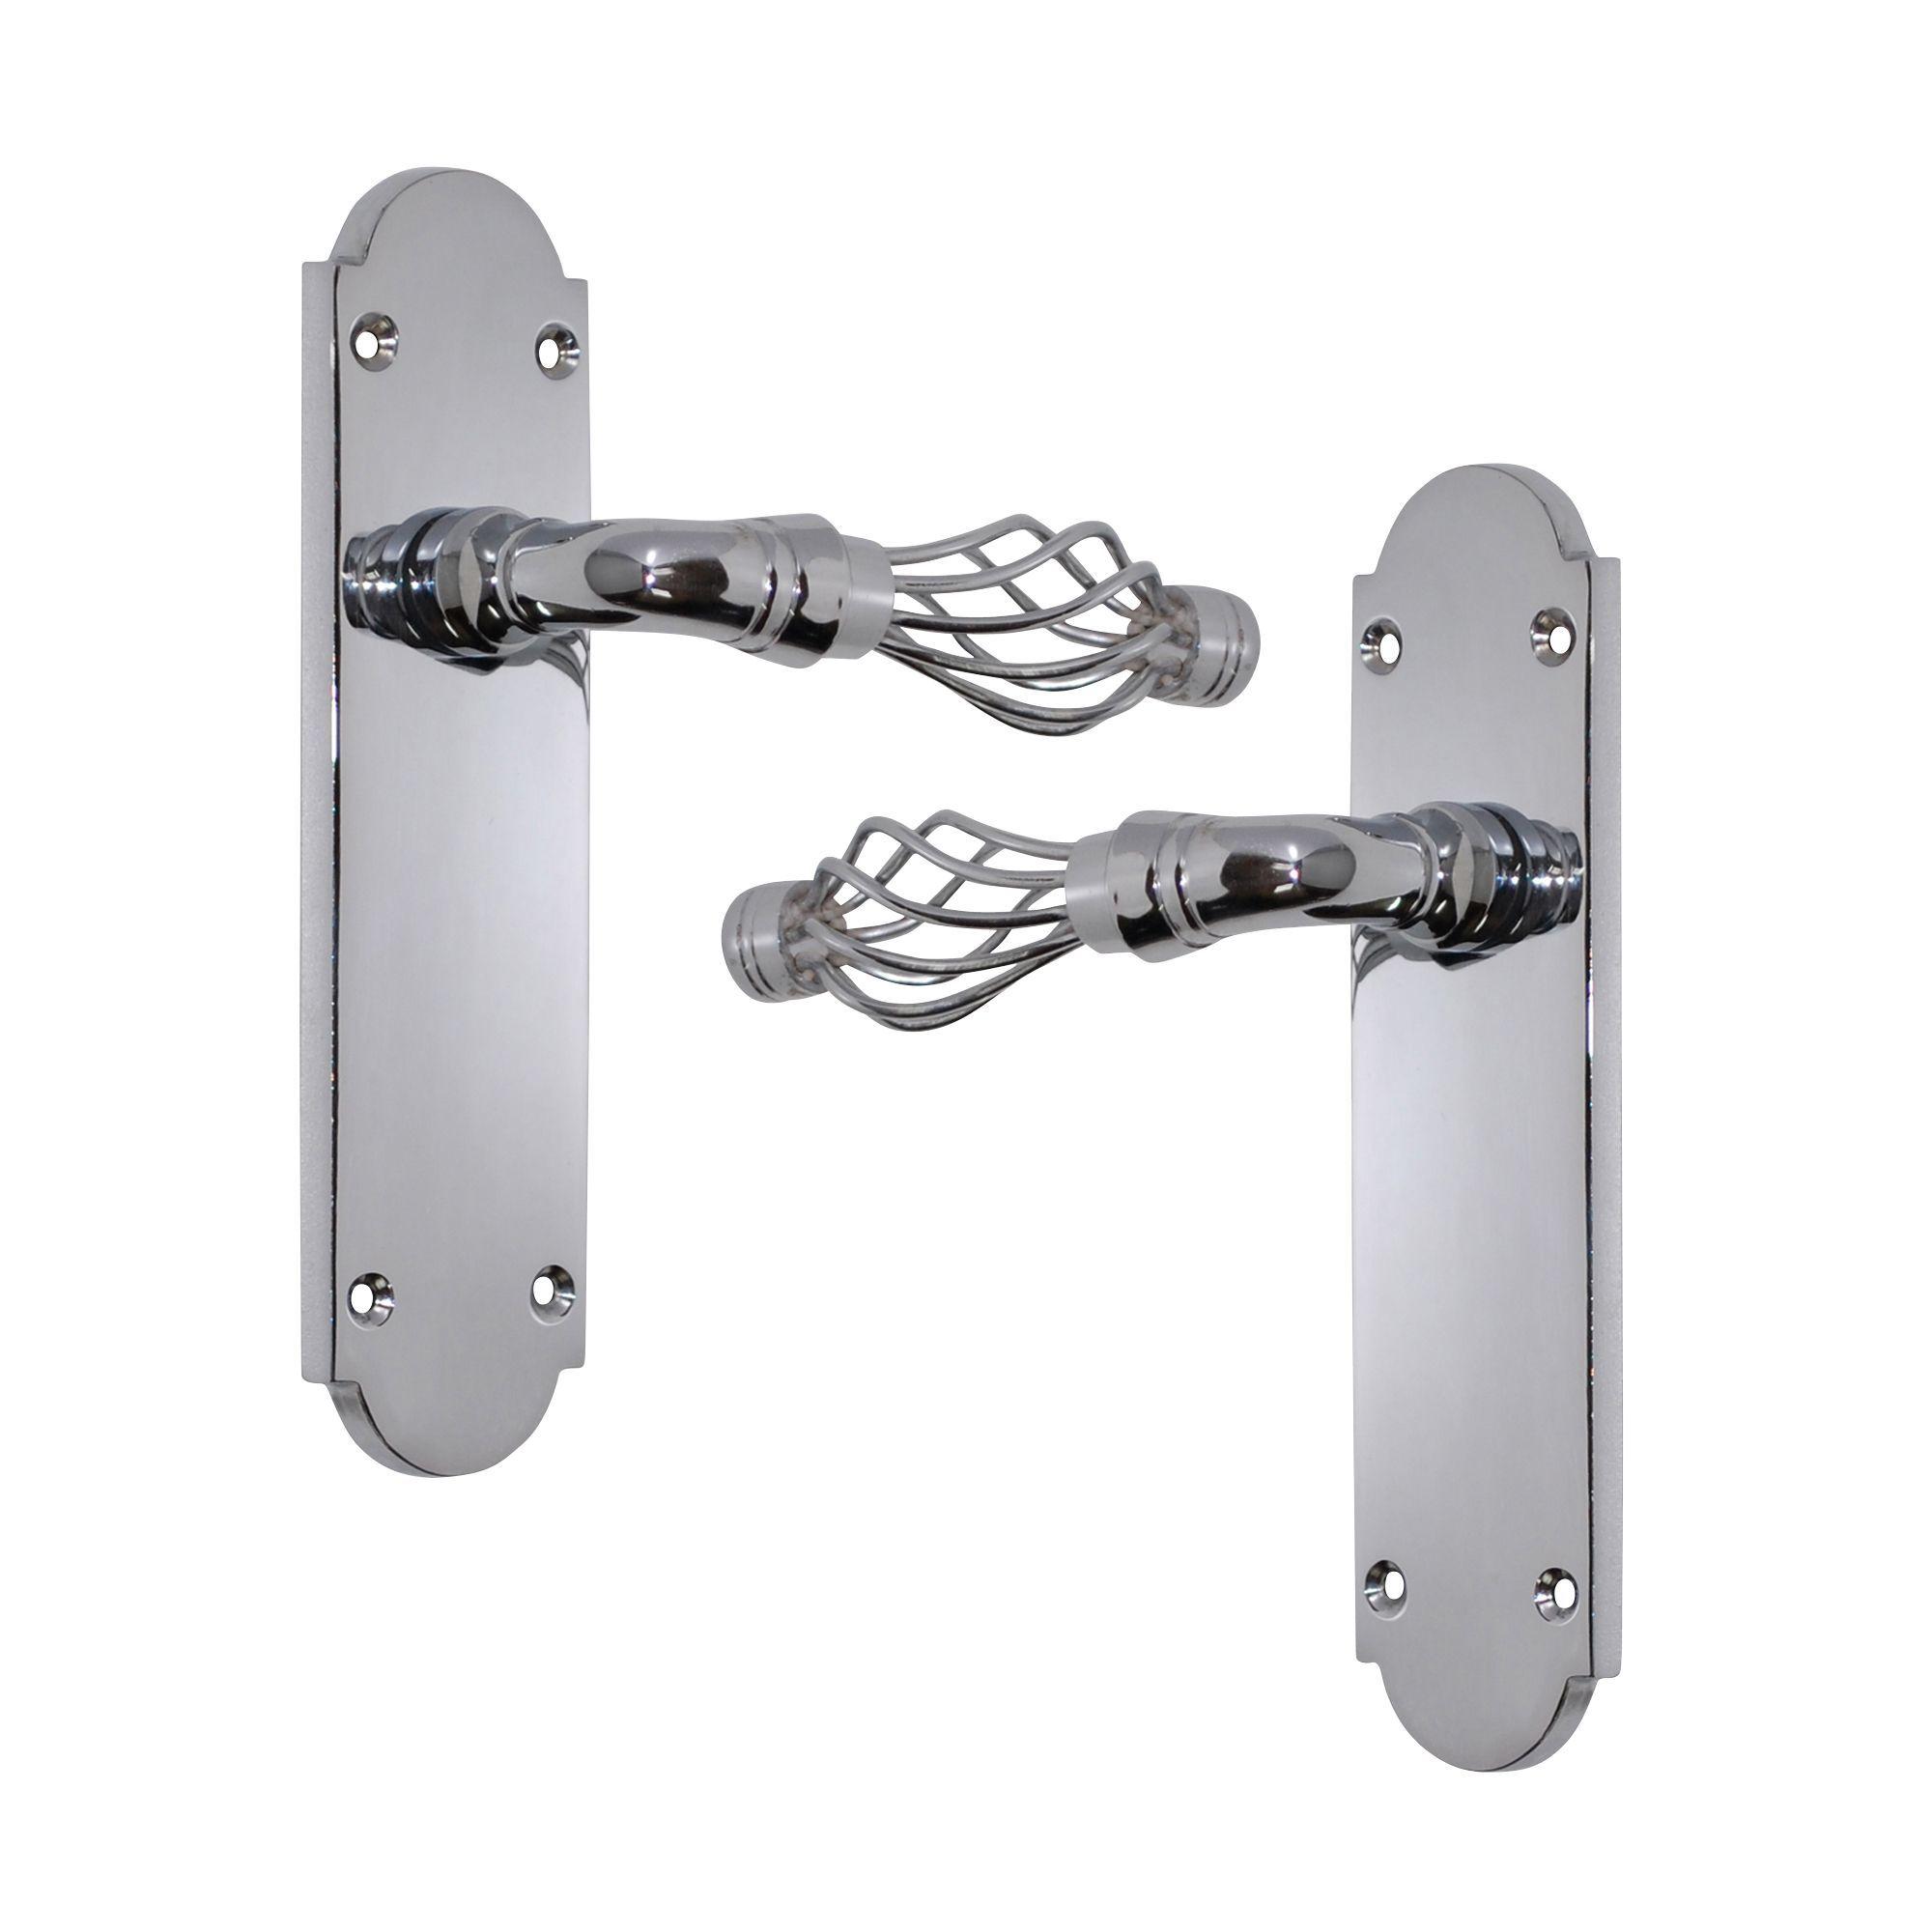 Polished Chrome Effect Internal Straight Latch Door Handle, 1 Set